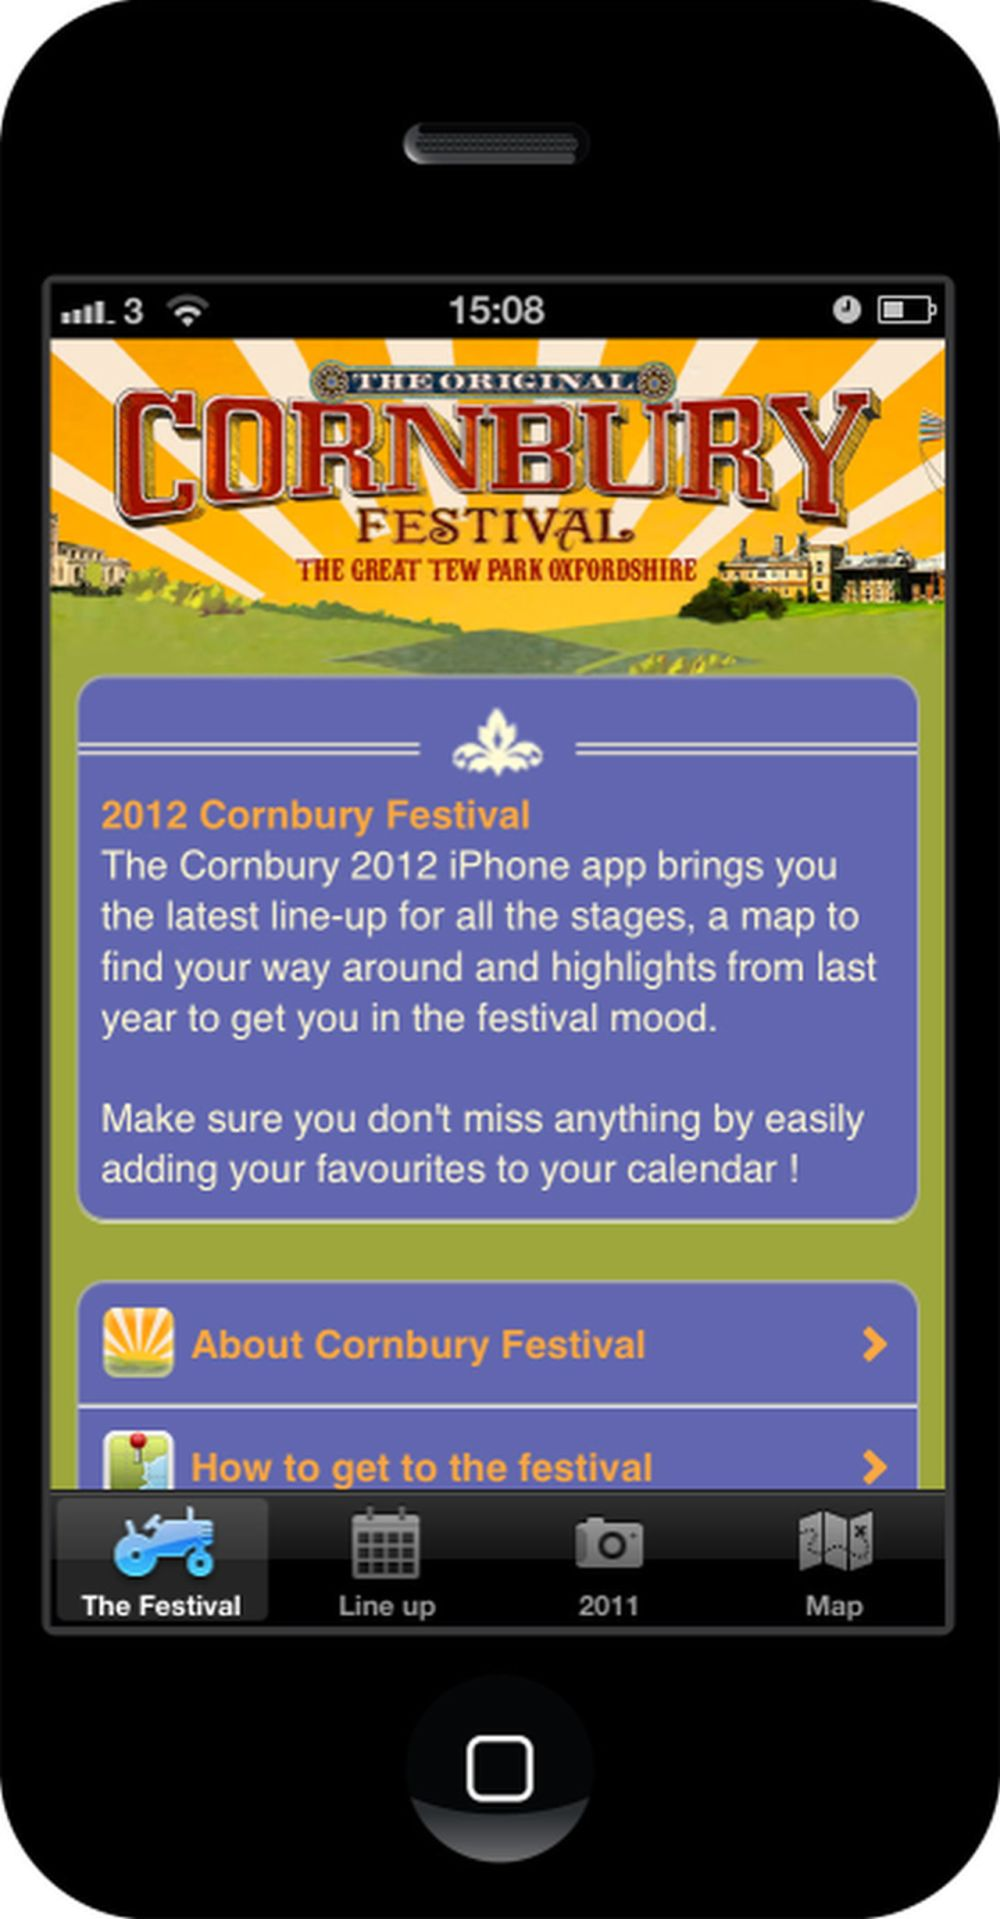 Cornbury Festival 2012 App homepage